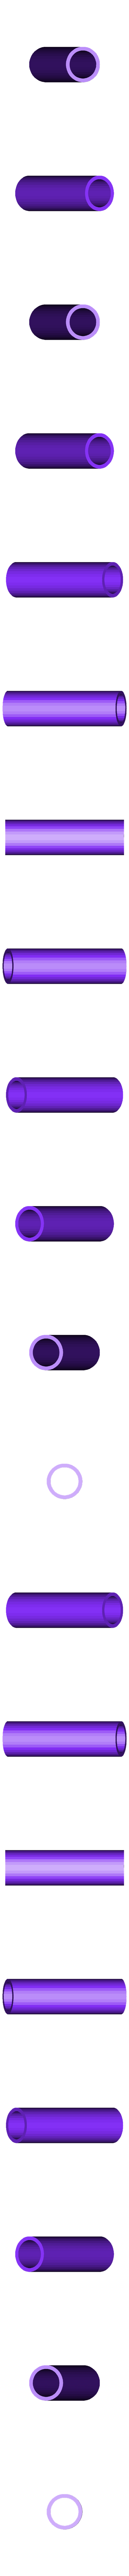 unioncañitas.stl Download free STL file Tiny whoop straw gate • 3D printer template, jarp1977